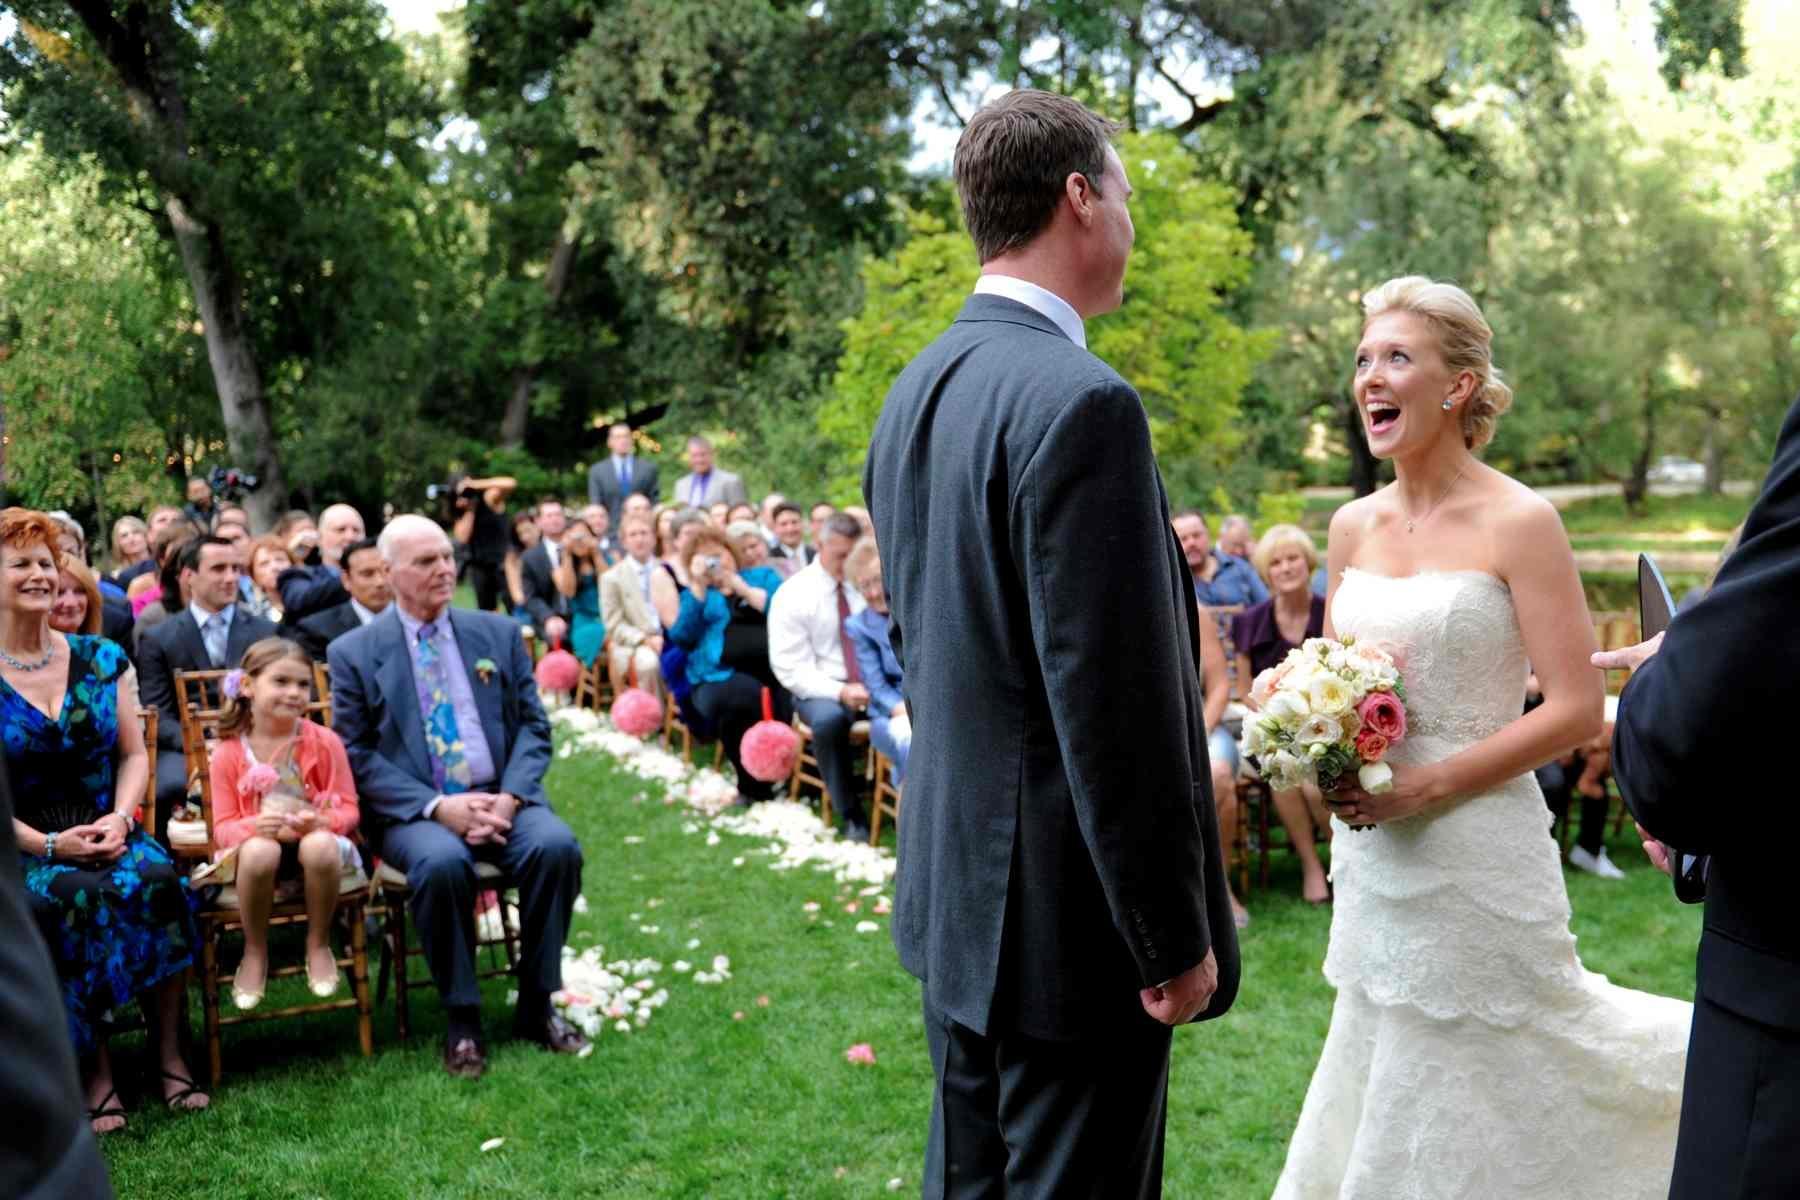 San Francisco Bay Area Destination Wedding Photographer Napa Valley Image / Photo